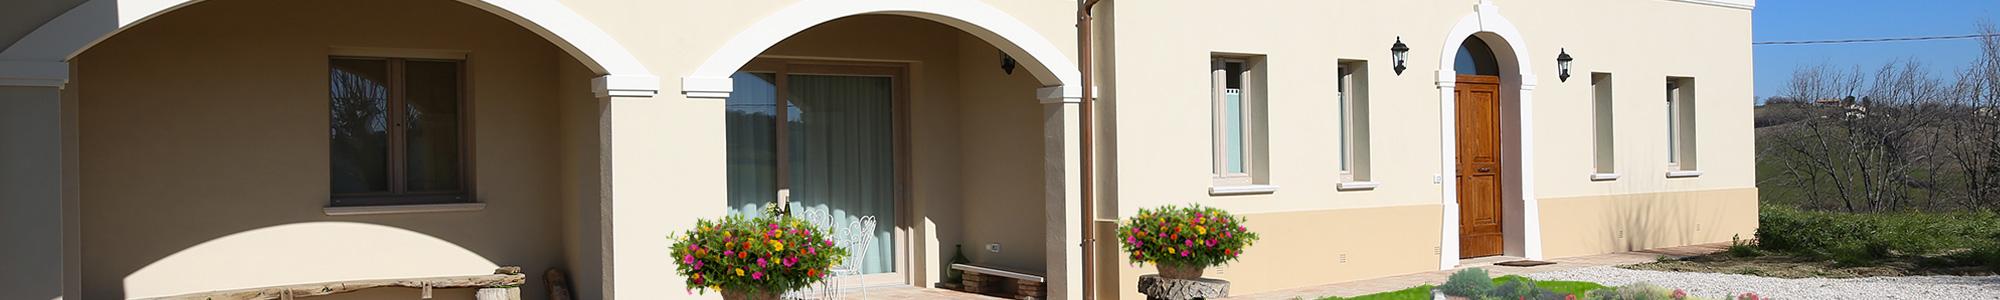 Slide-Villa-marietta-300